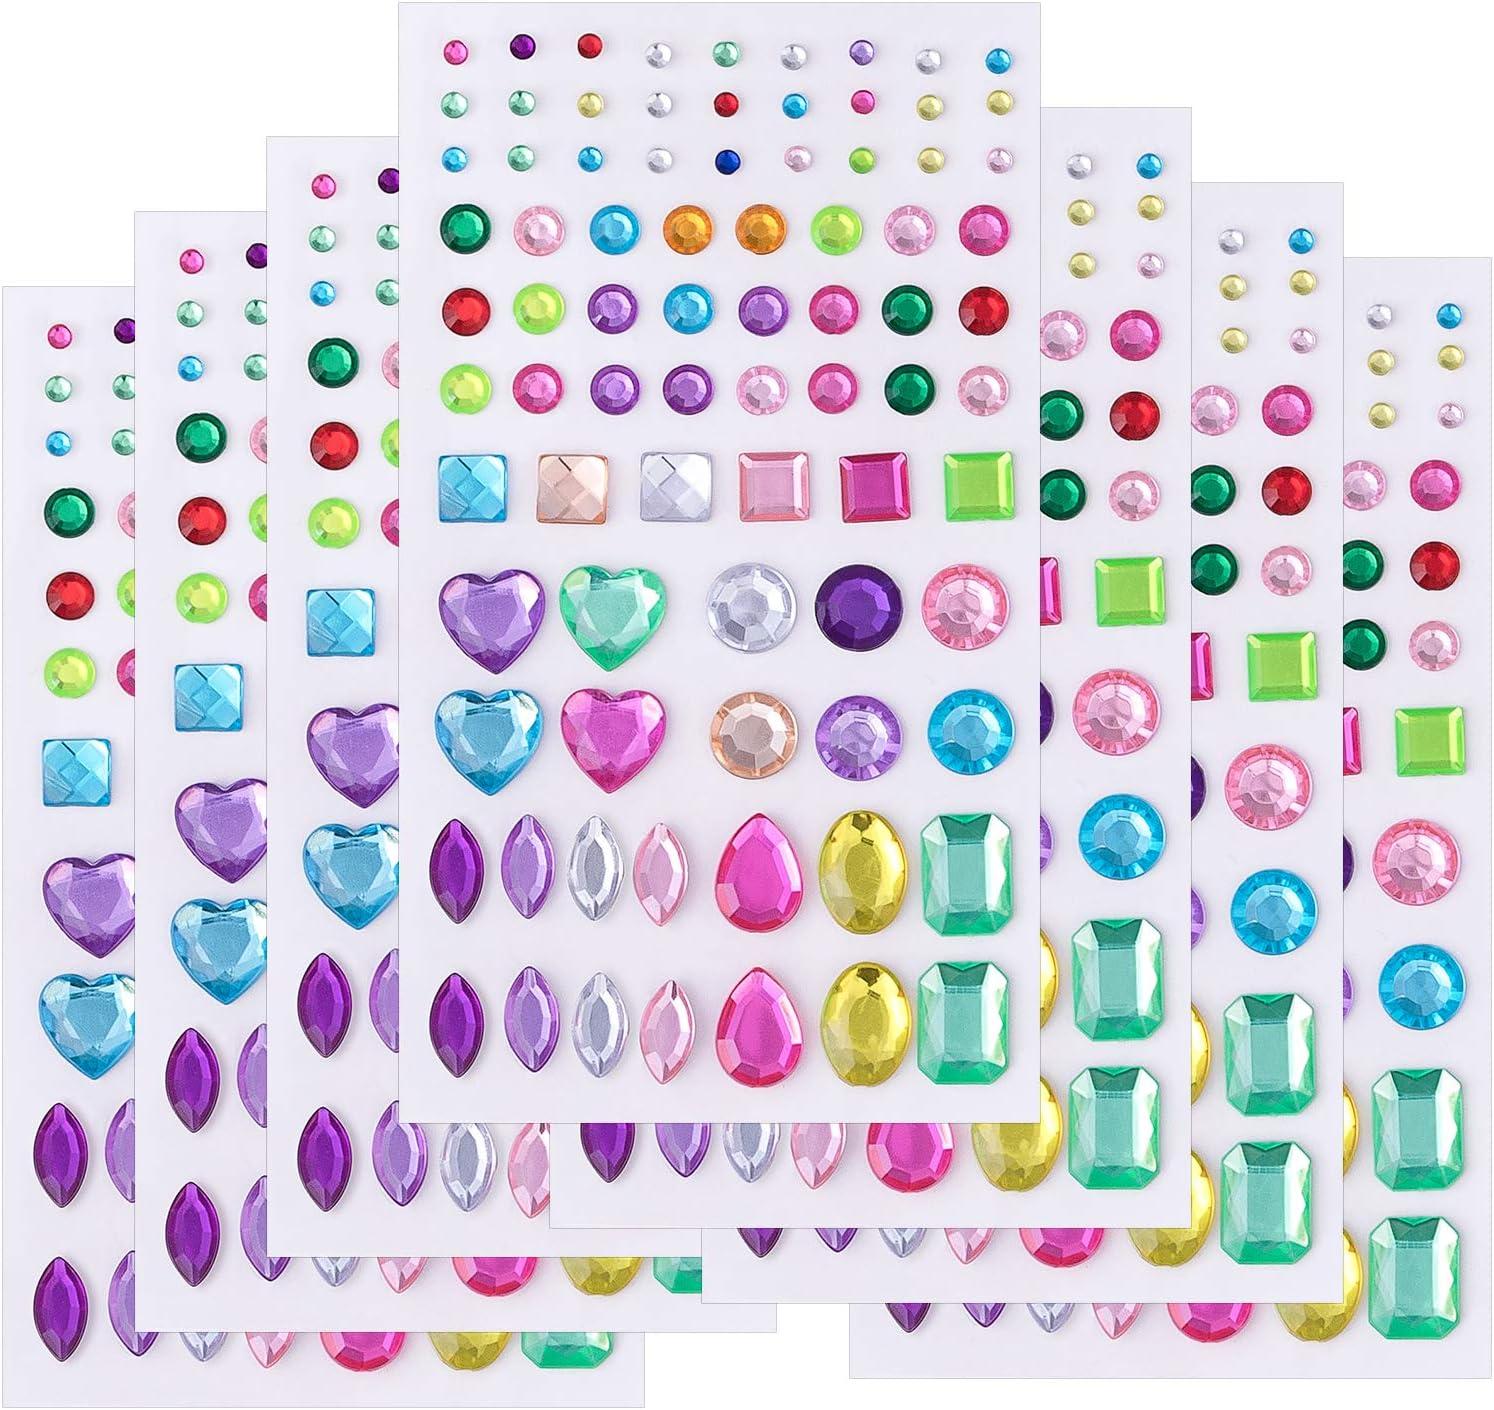 Gwolf Pegatinas diamantes imitaci/ón Pegatinas gemas cristal autoadhesivas Accesorios bricolaje 20 colores Pegatinas de diamantes de imitaci/ón acr/ílico para manualidades